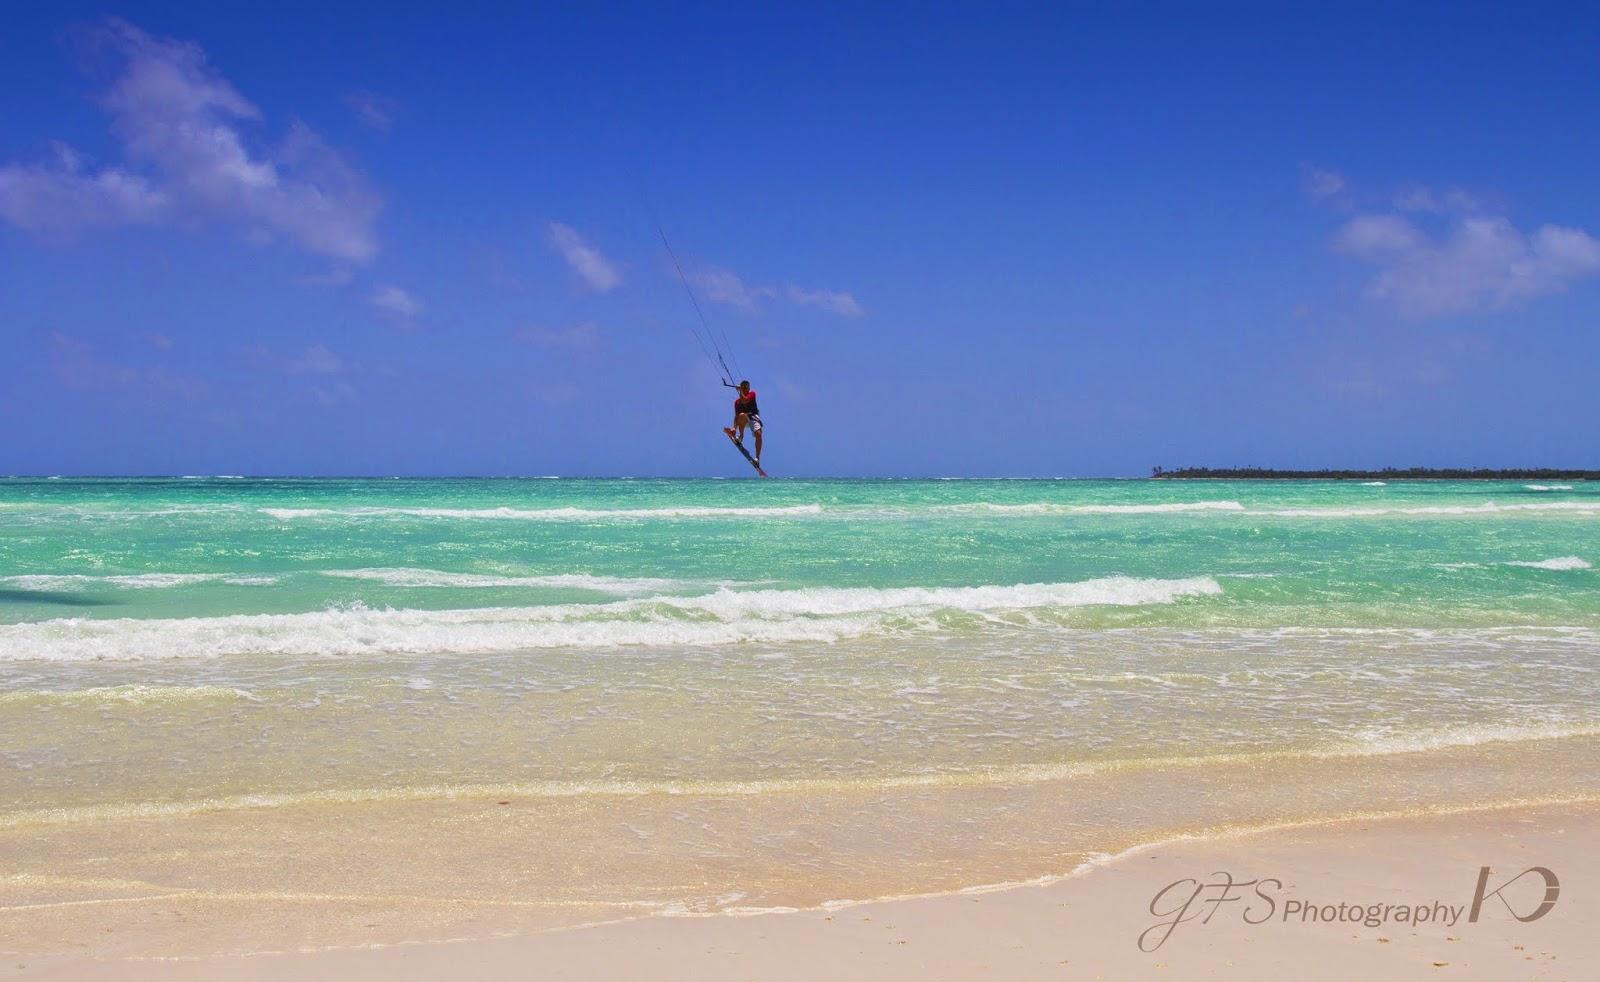 boca paila esturay sian ka'an kitesurf spot kiteboarding jump